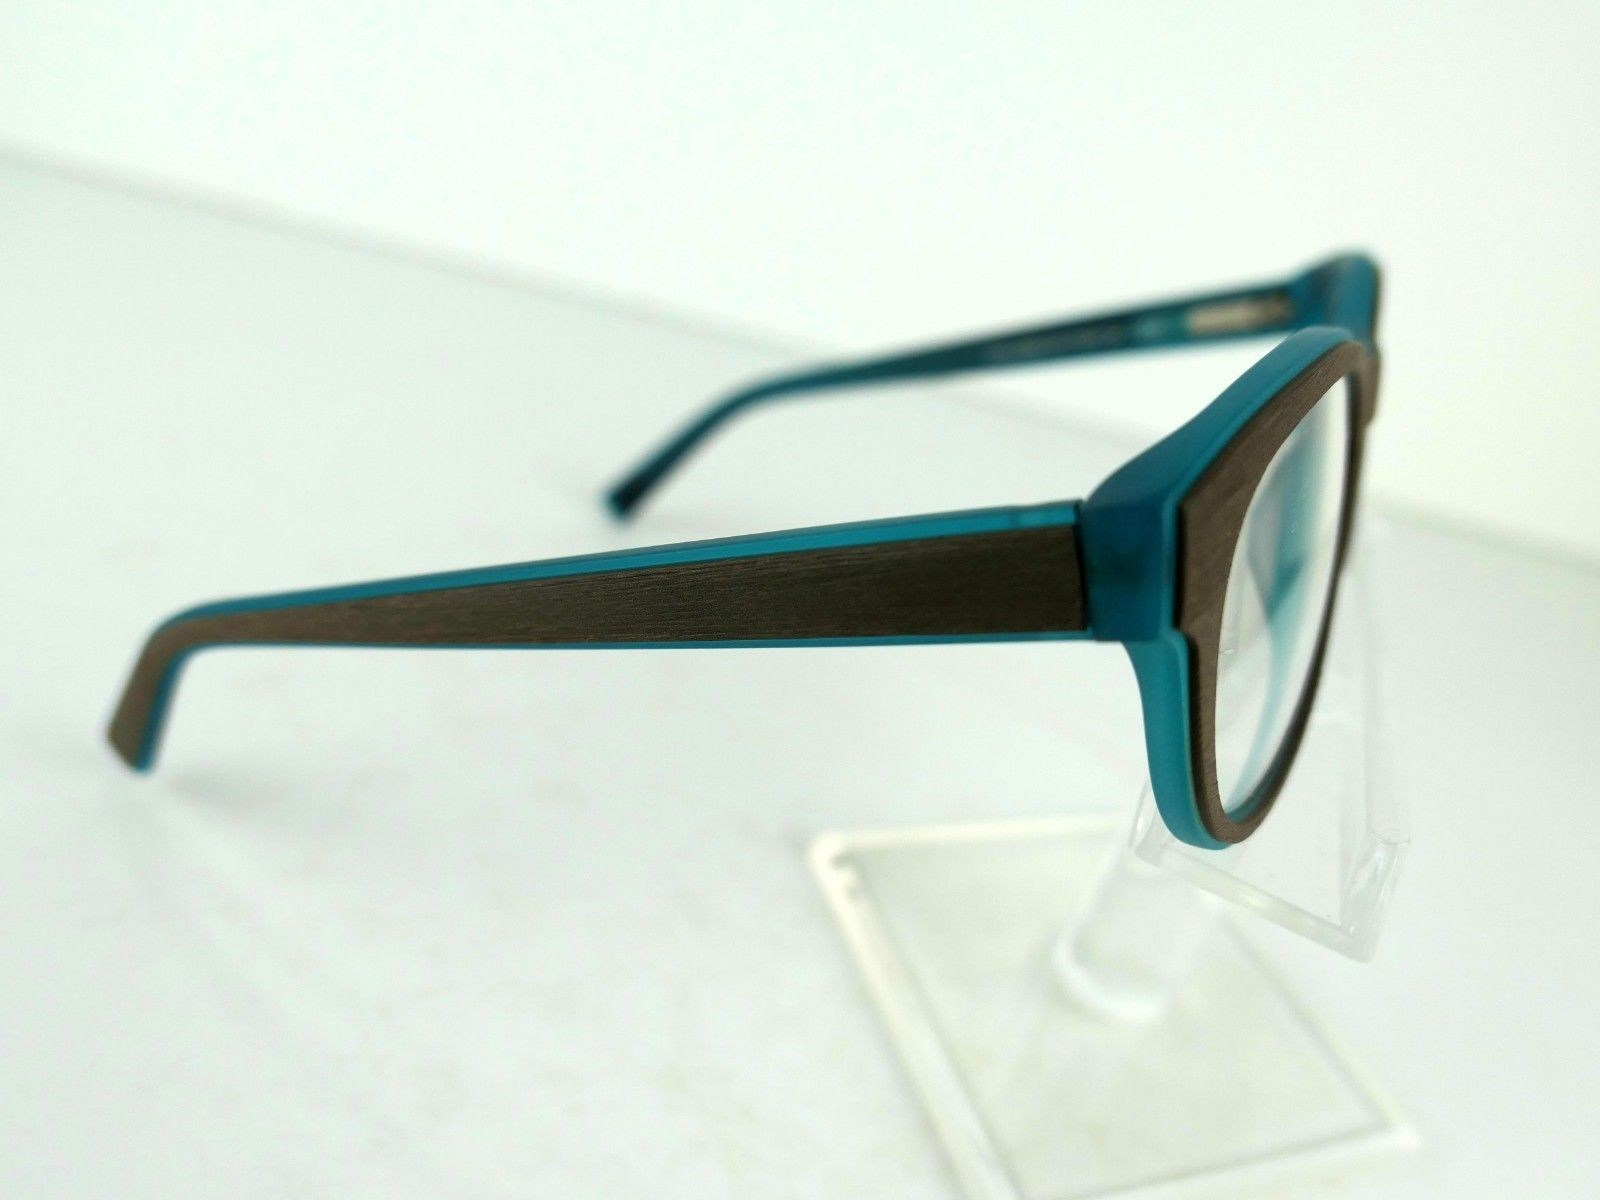 PRODESIGN DENMARK 1779 (5036) Dark Brown Brushed 51  x 17 Eyeglass Frames image 2